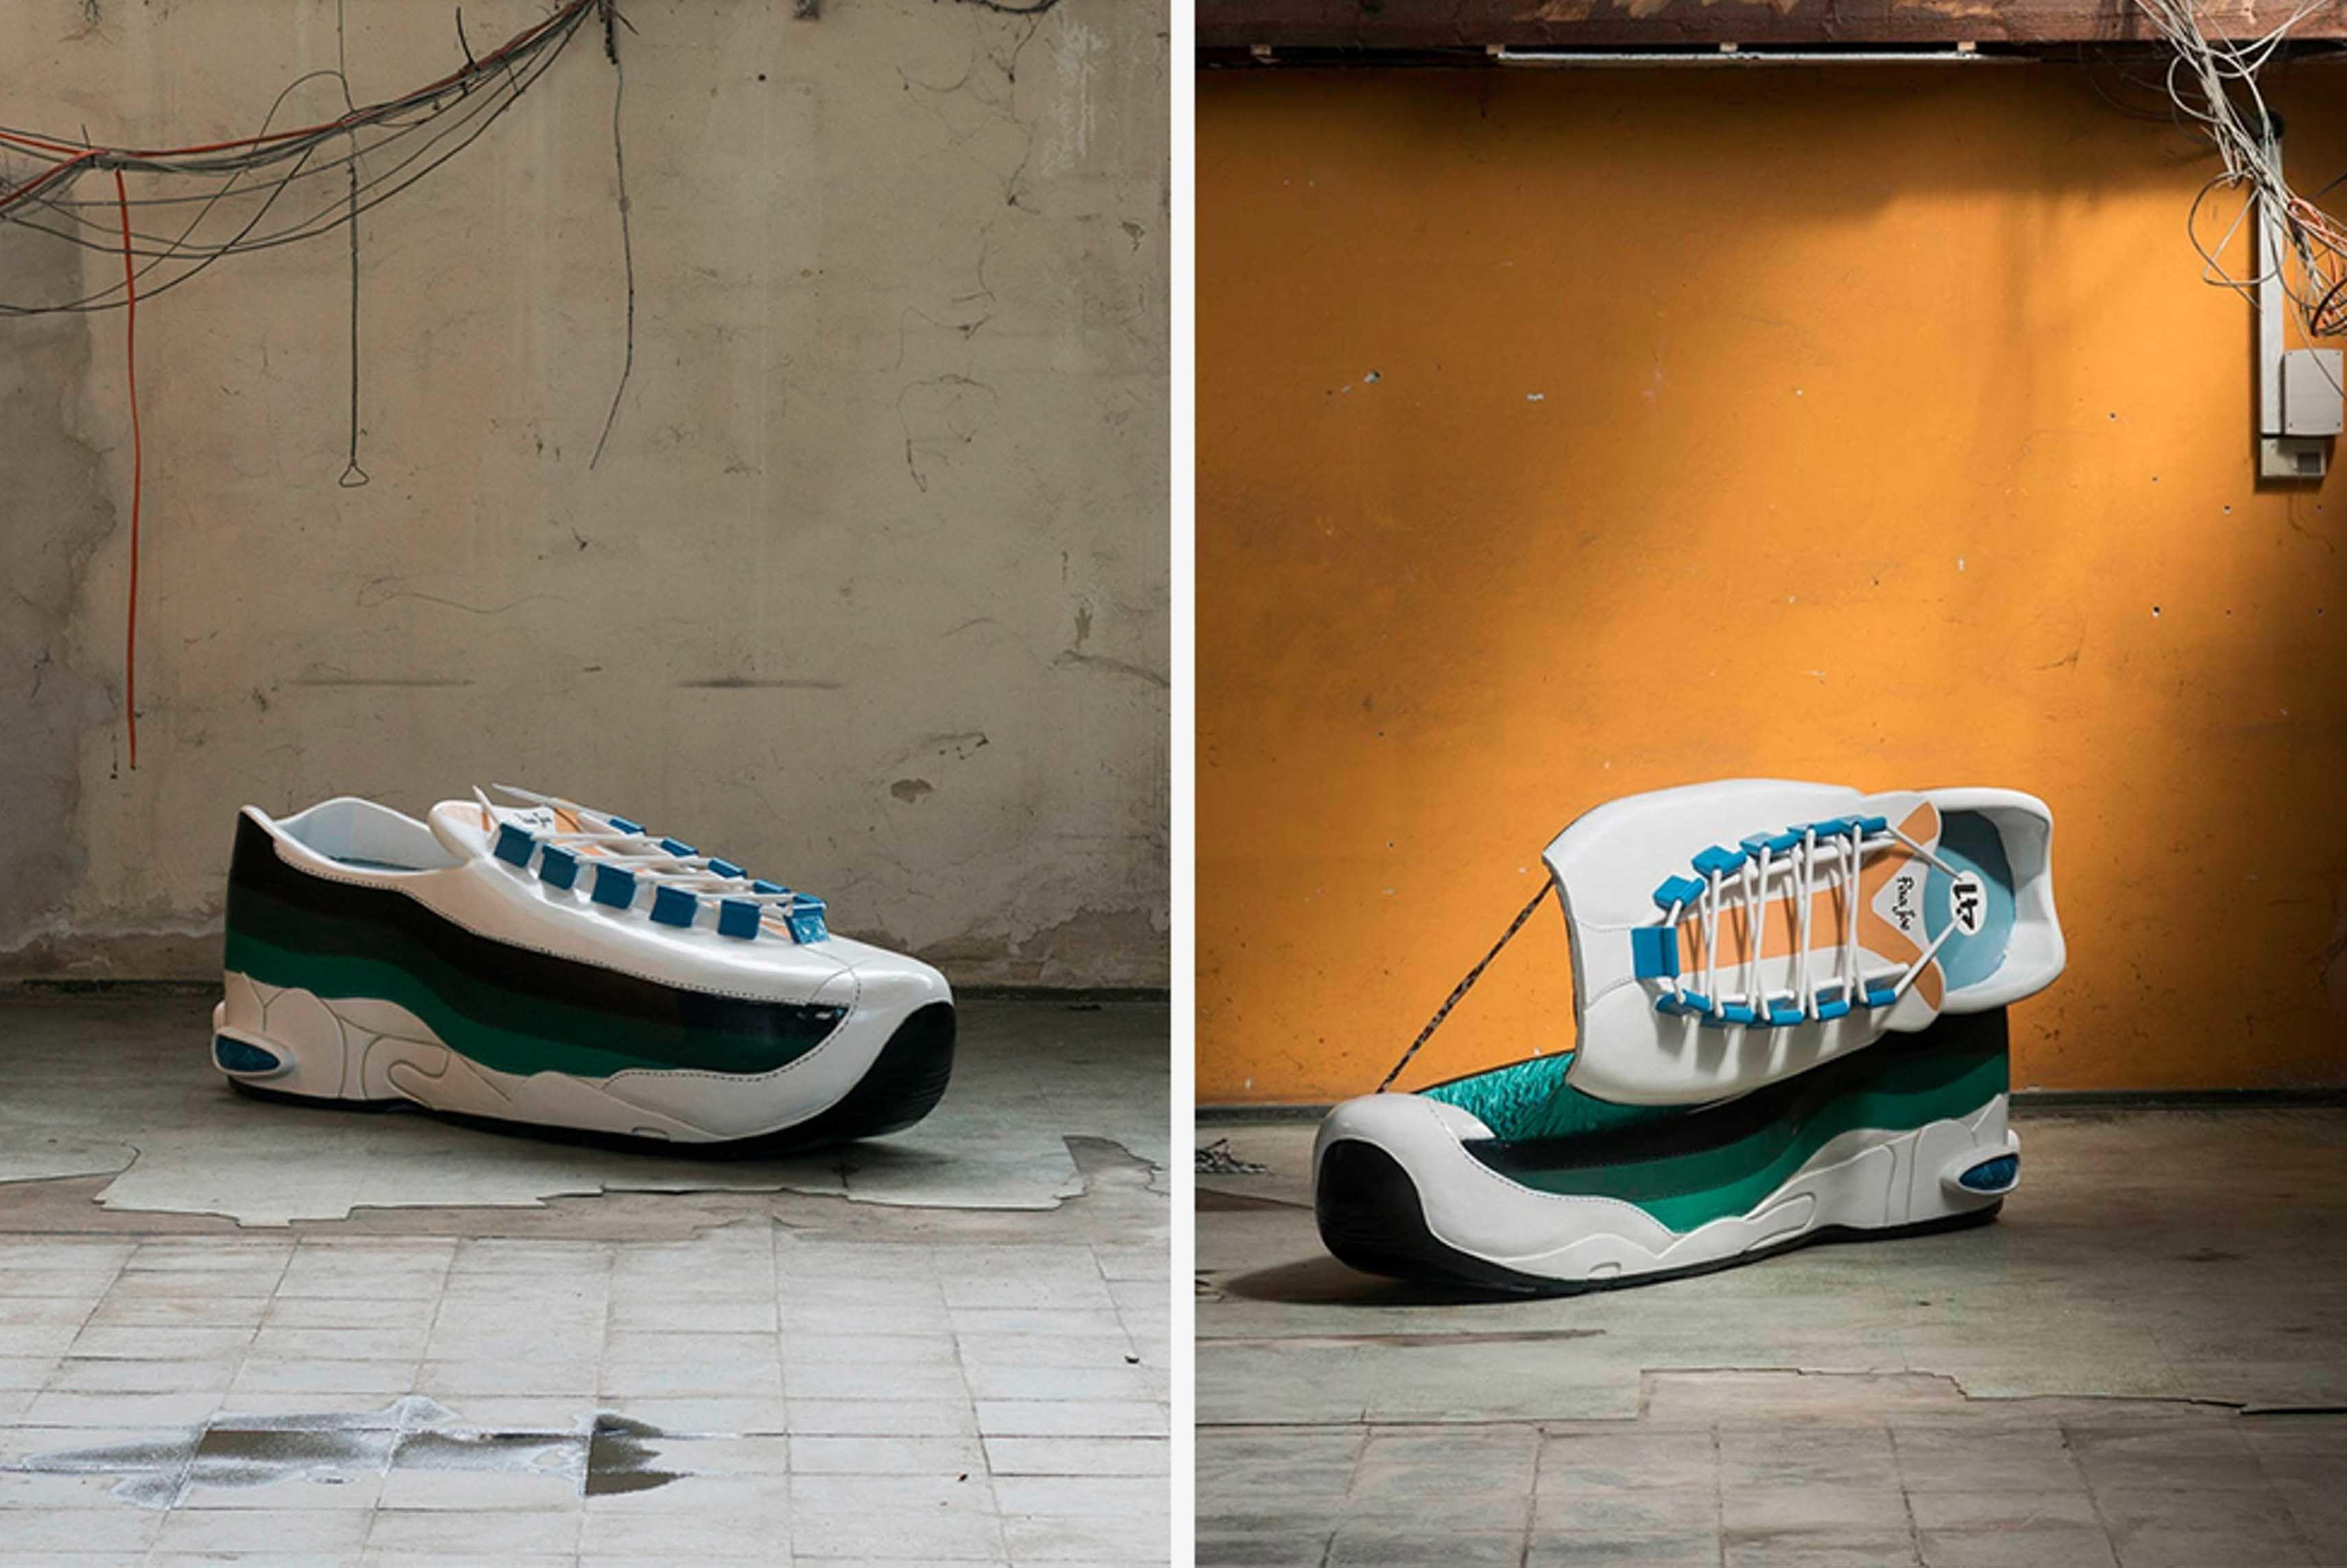 Giant Air Max 95 Coffin Paa Joe 2 Sneaker Freaker